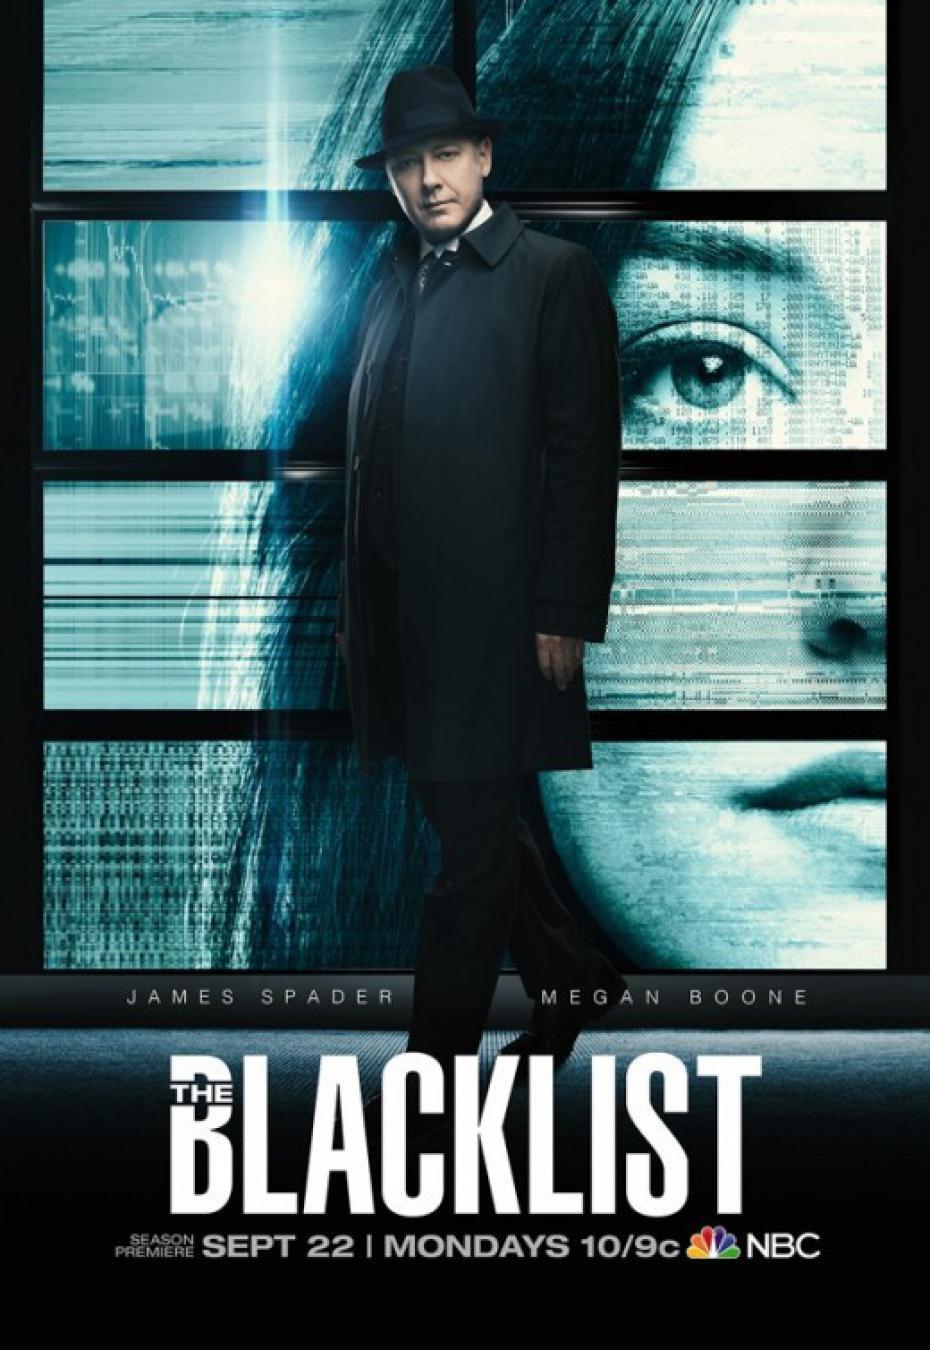 THE BLACKLIST: Season 2 TV Show Trailers, Poster, Image ...